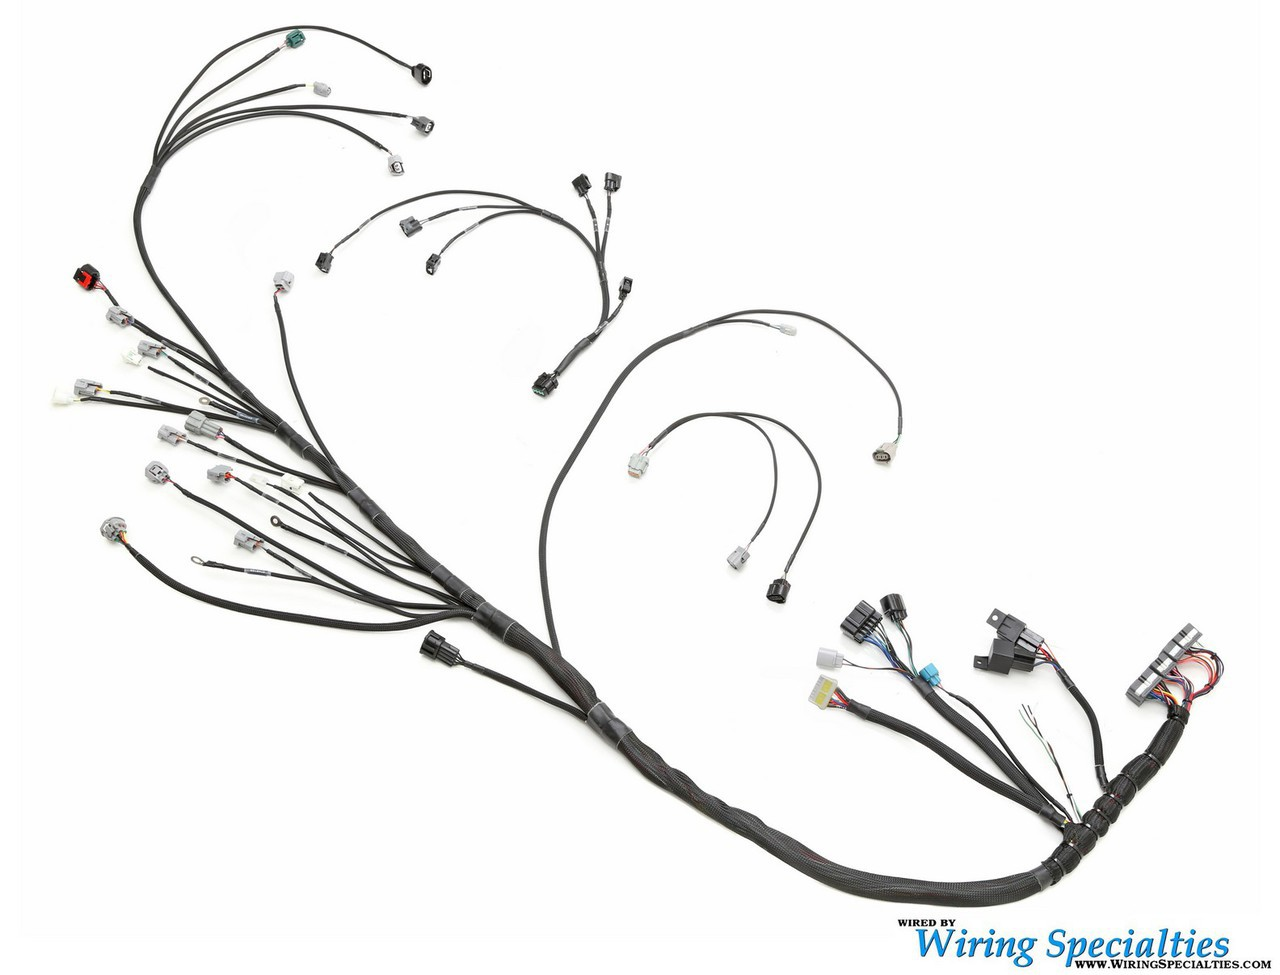 Wiring Specialties 1JZGTE 240sx S13 Wiring Harness